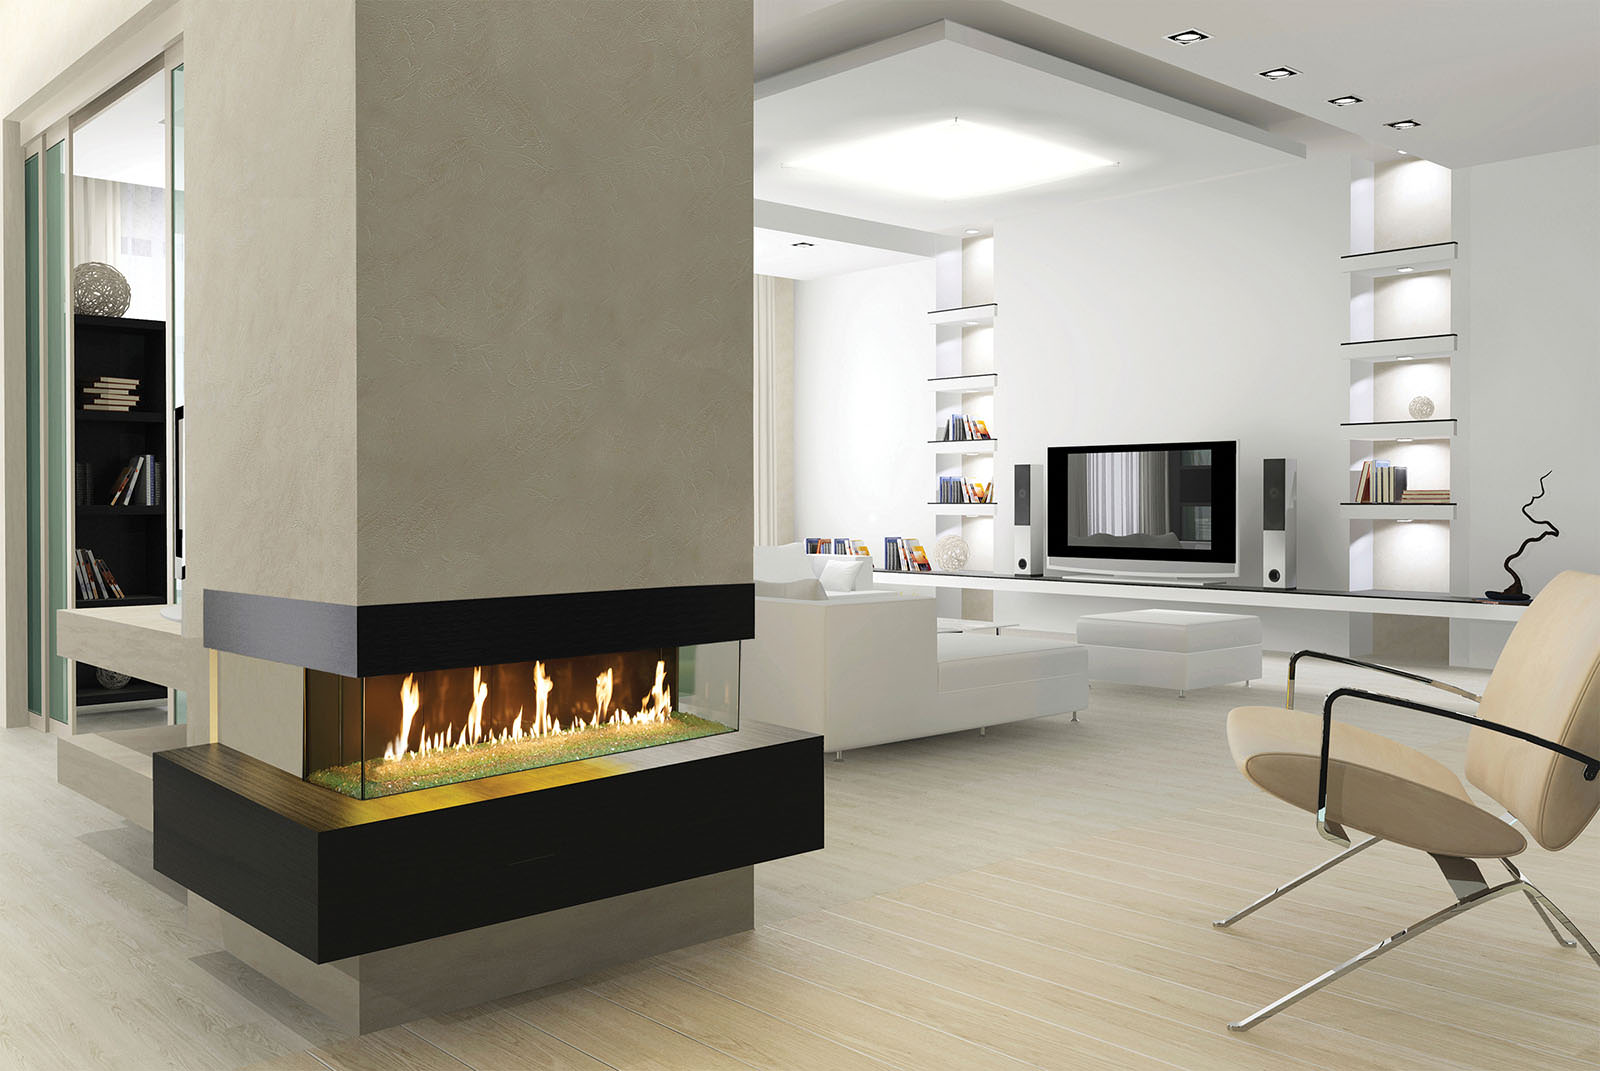 Davinci Gas Fireplace Bay 72x12 109136